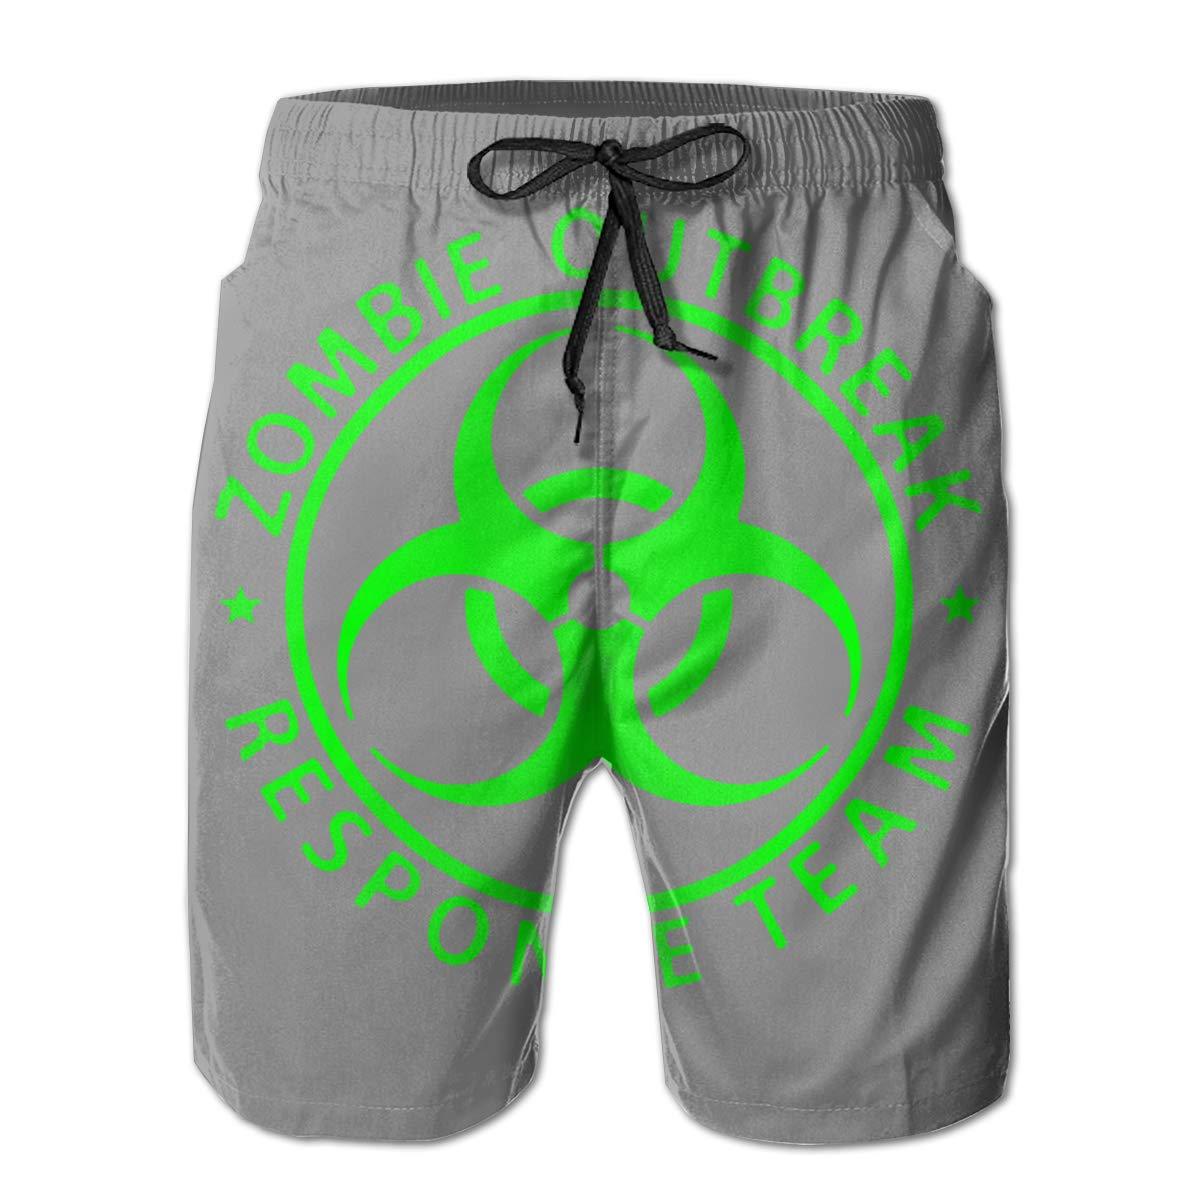 LLXM Zombie Outbreak Response Team Men Swim Trunks Quick Dry Waterproof Beach Pants Beach Board Shorts